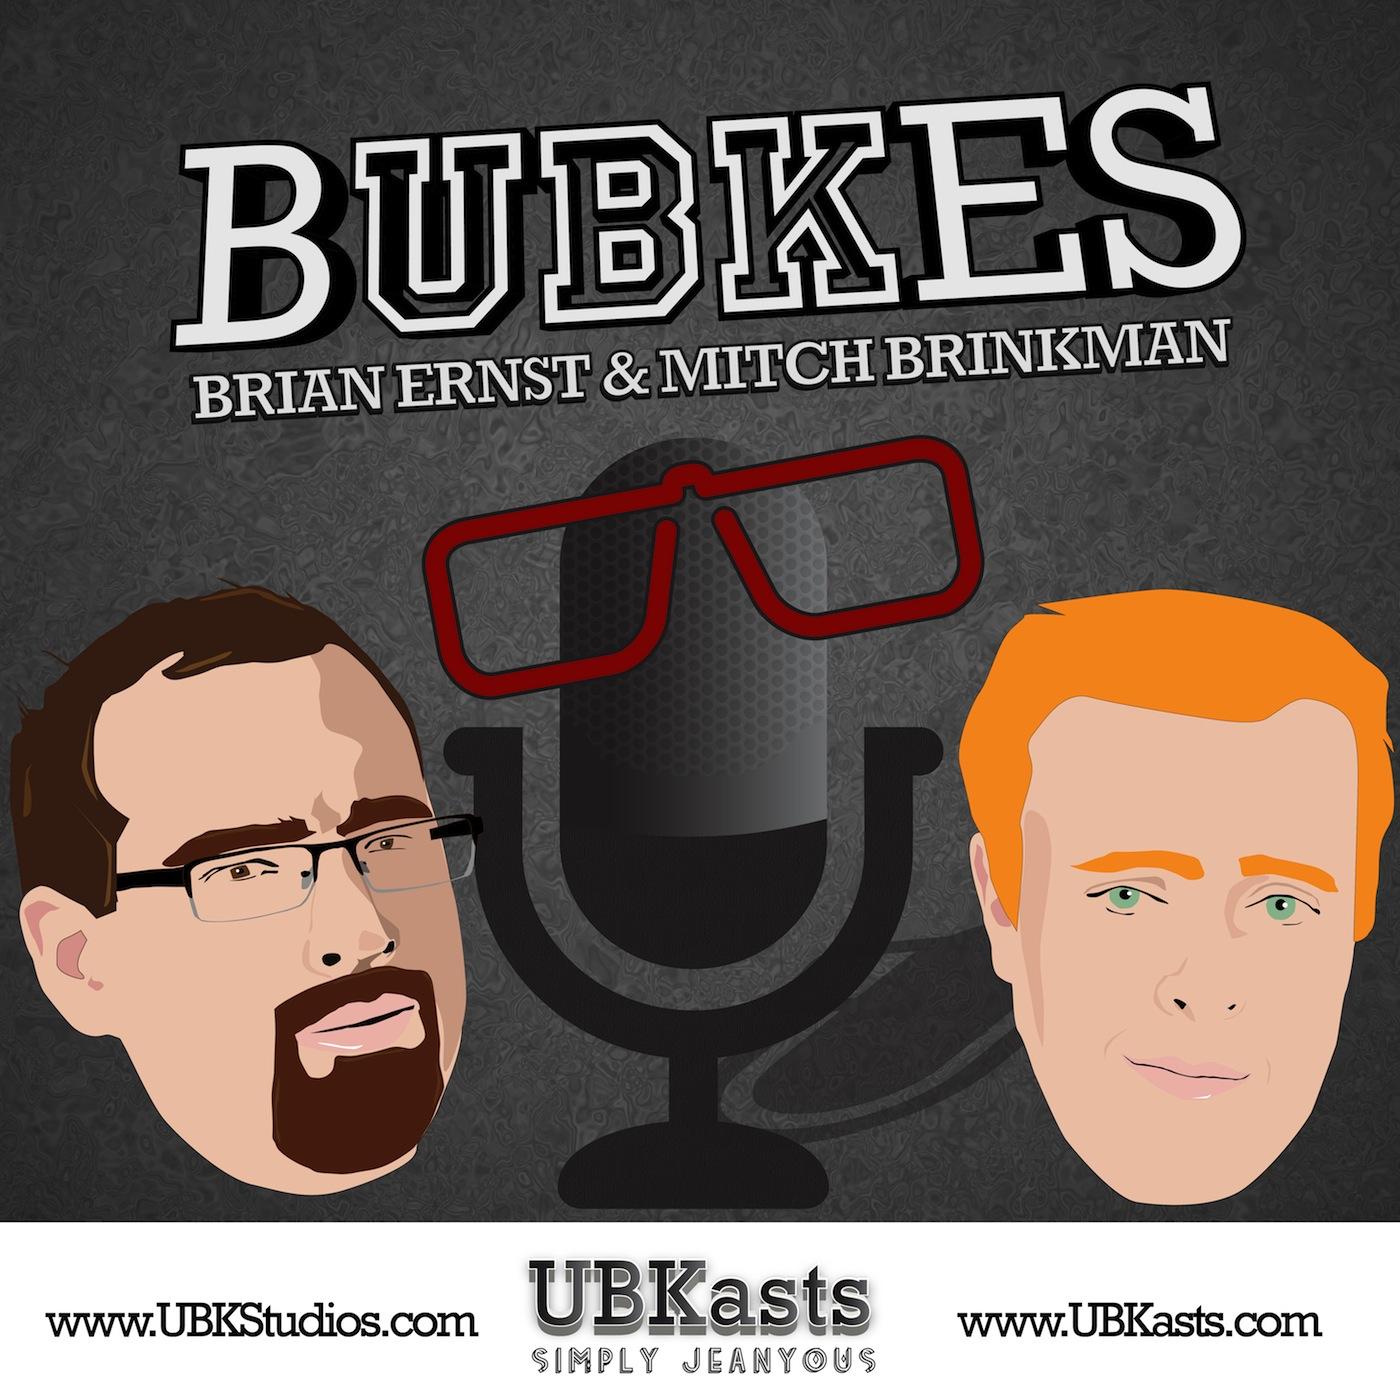 Bubkes Logo w Cartoons-03 LARGE.jpg